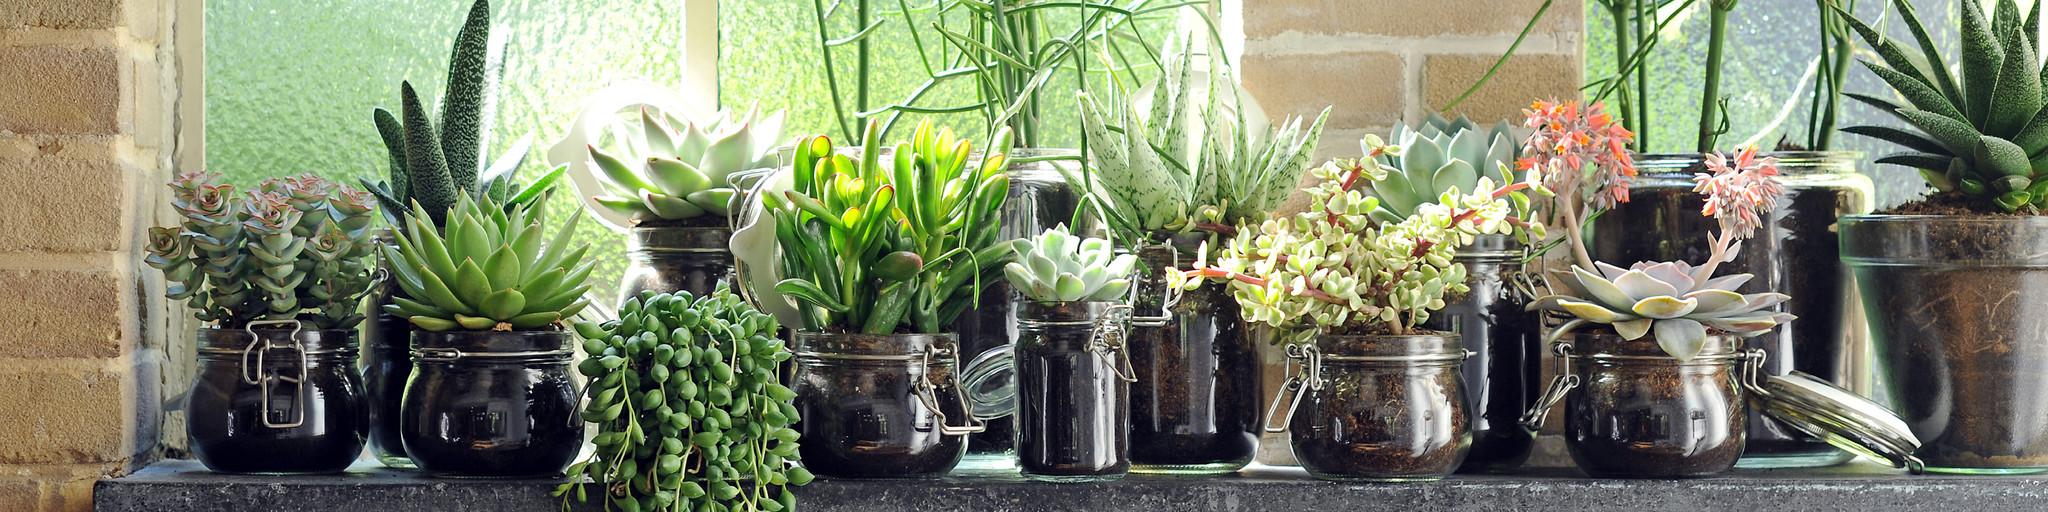 Best quality plants online! banner 3